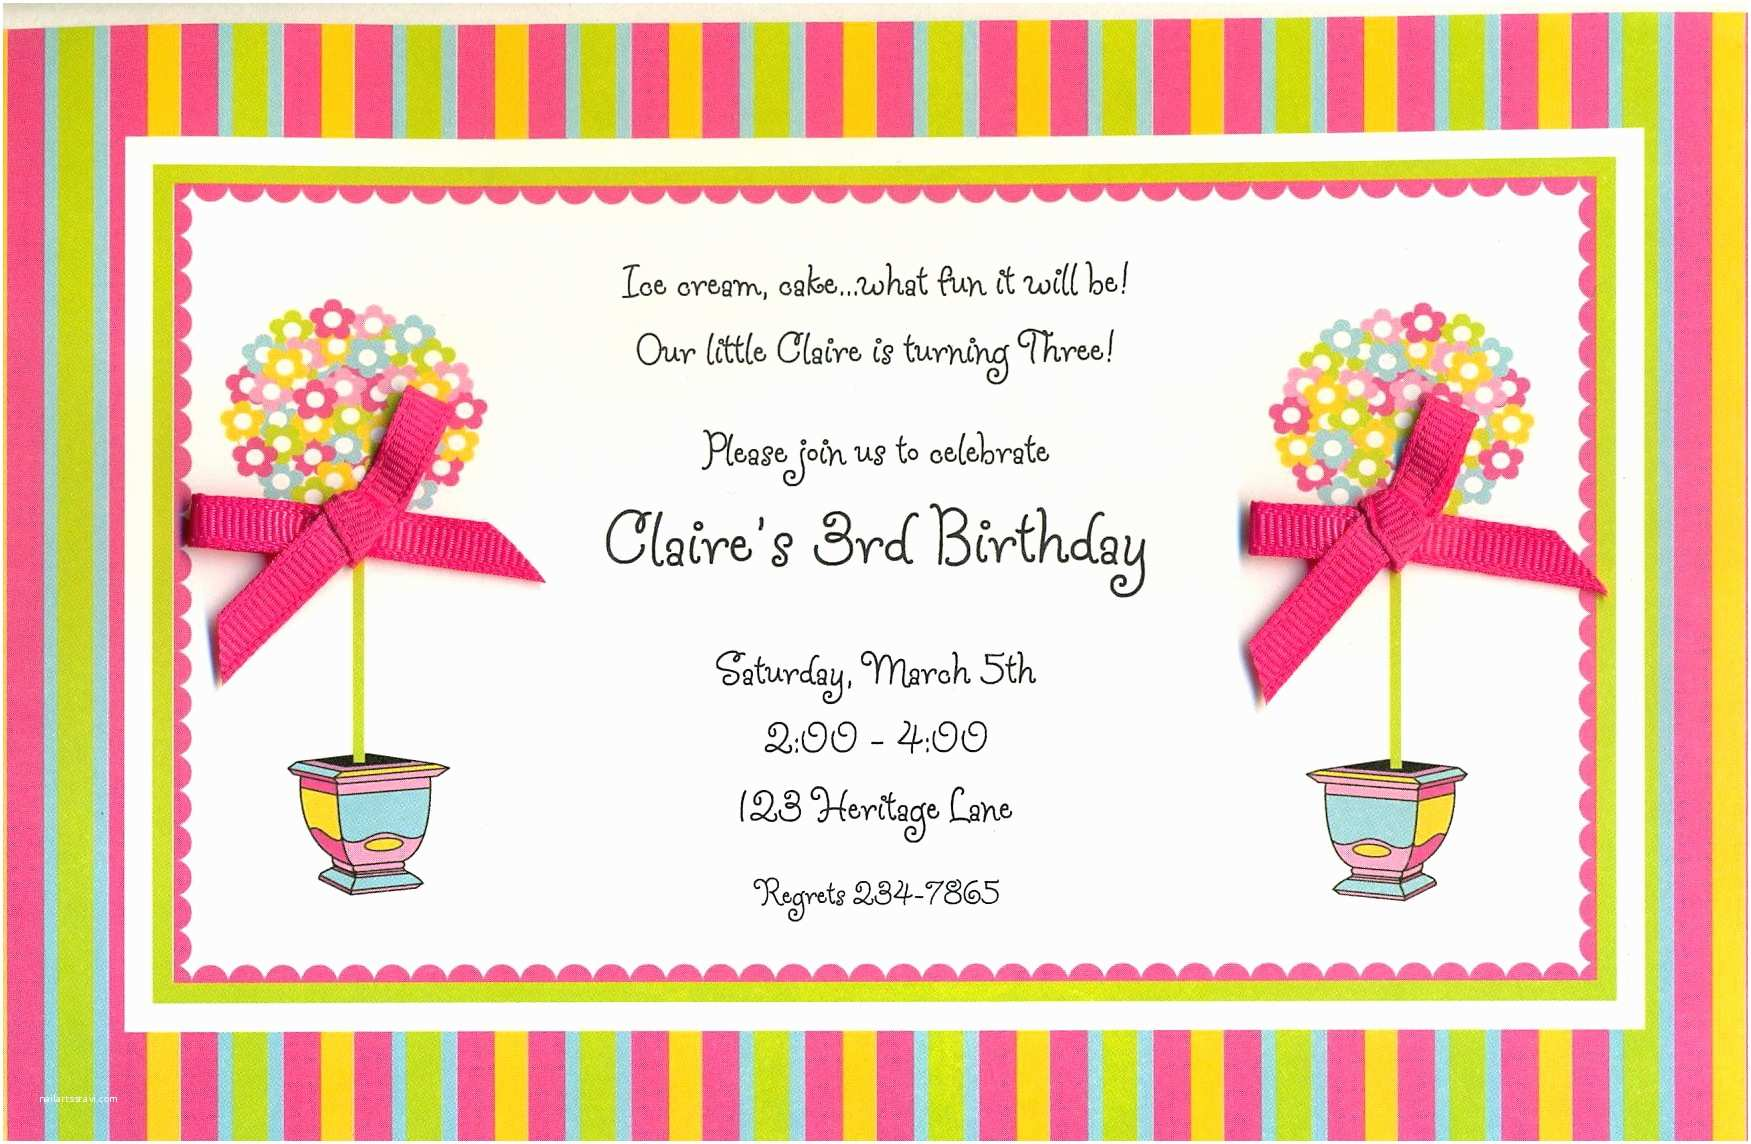 Birthday Invitations Wording Dinner Party Invitation